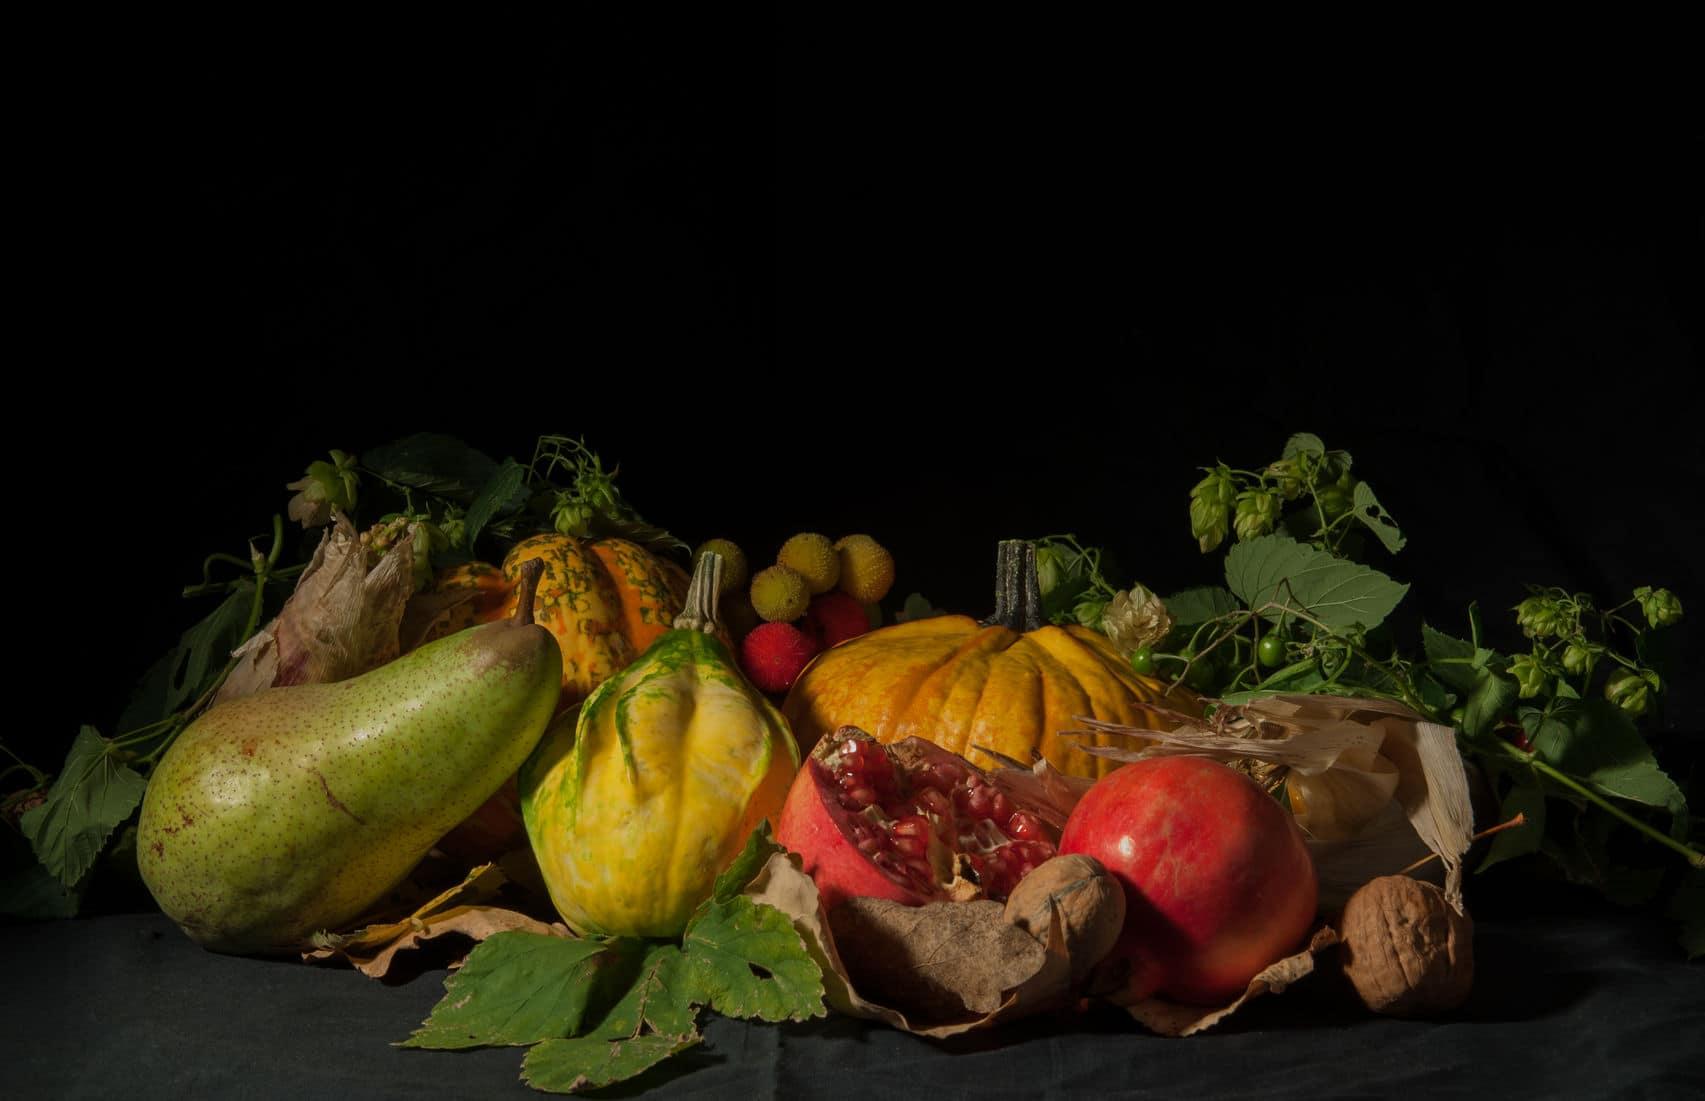 Autumn recipes for healthy lungs nurtureworks yoga autumn recipes forumfinder Gallery